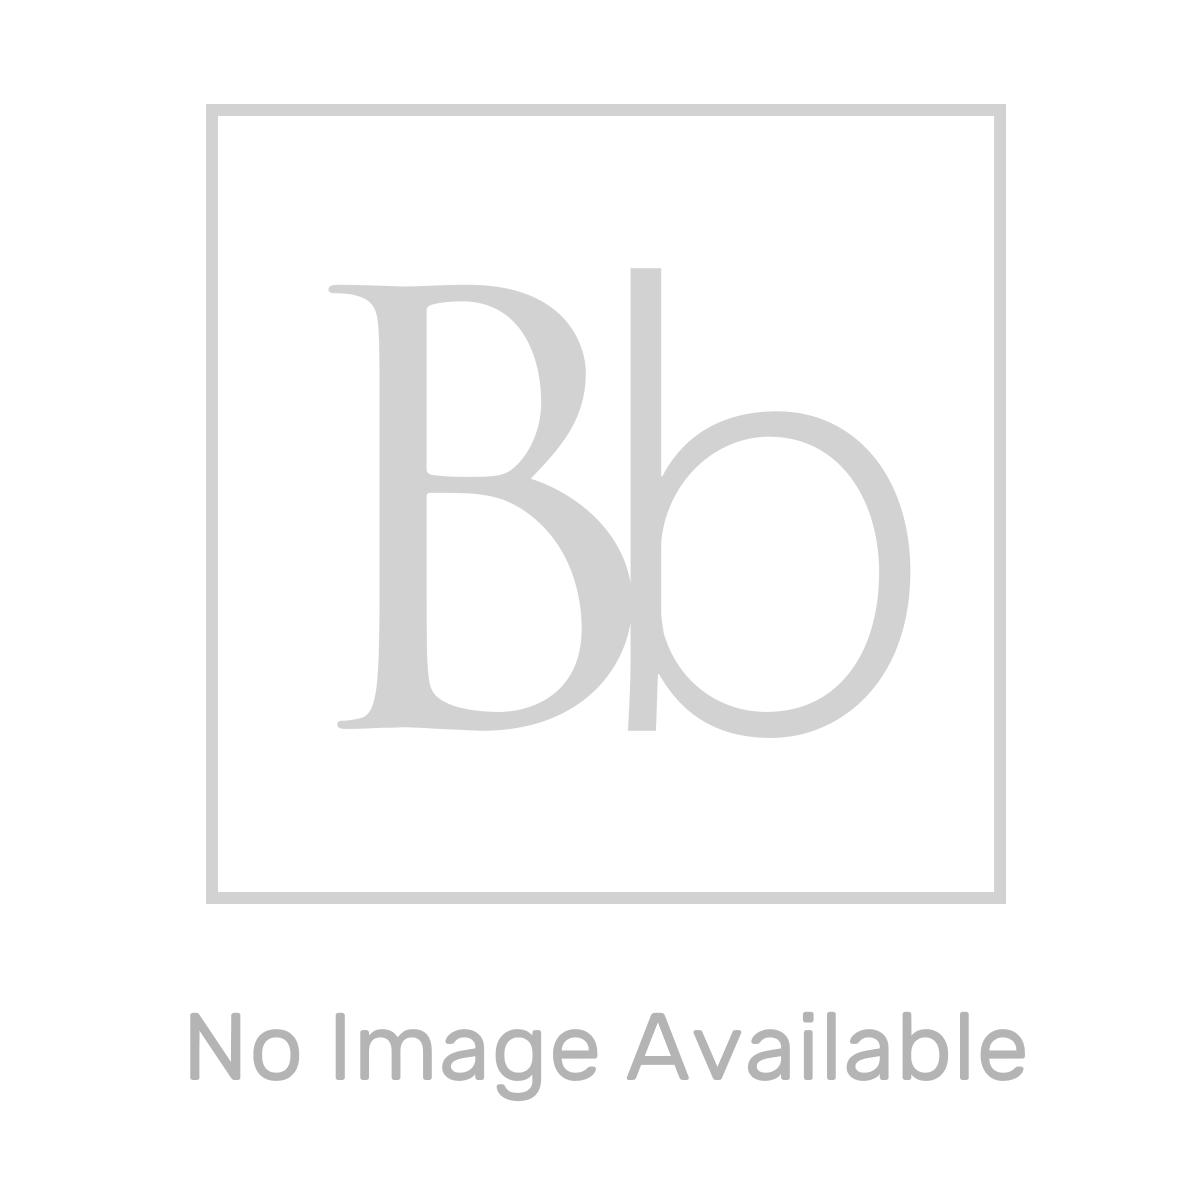 Salamander RP120SU 3.6 Bar Single Universal Whole House Shower Pump Left Side